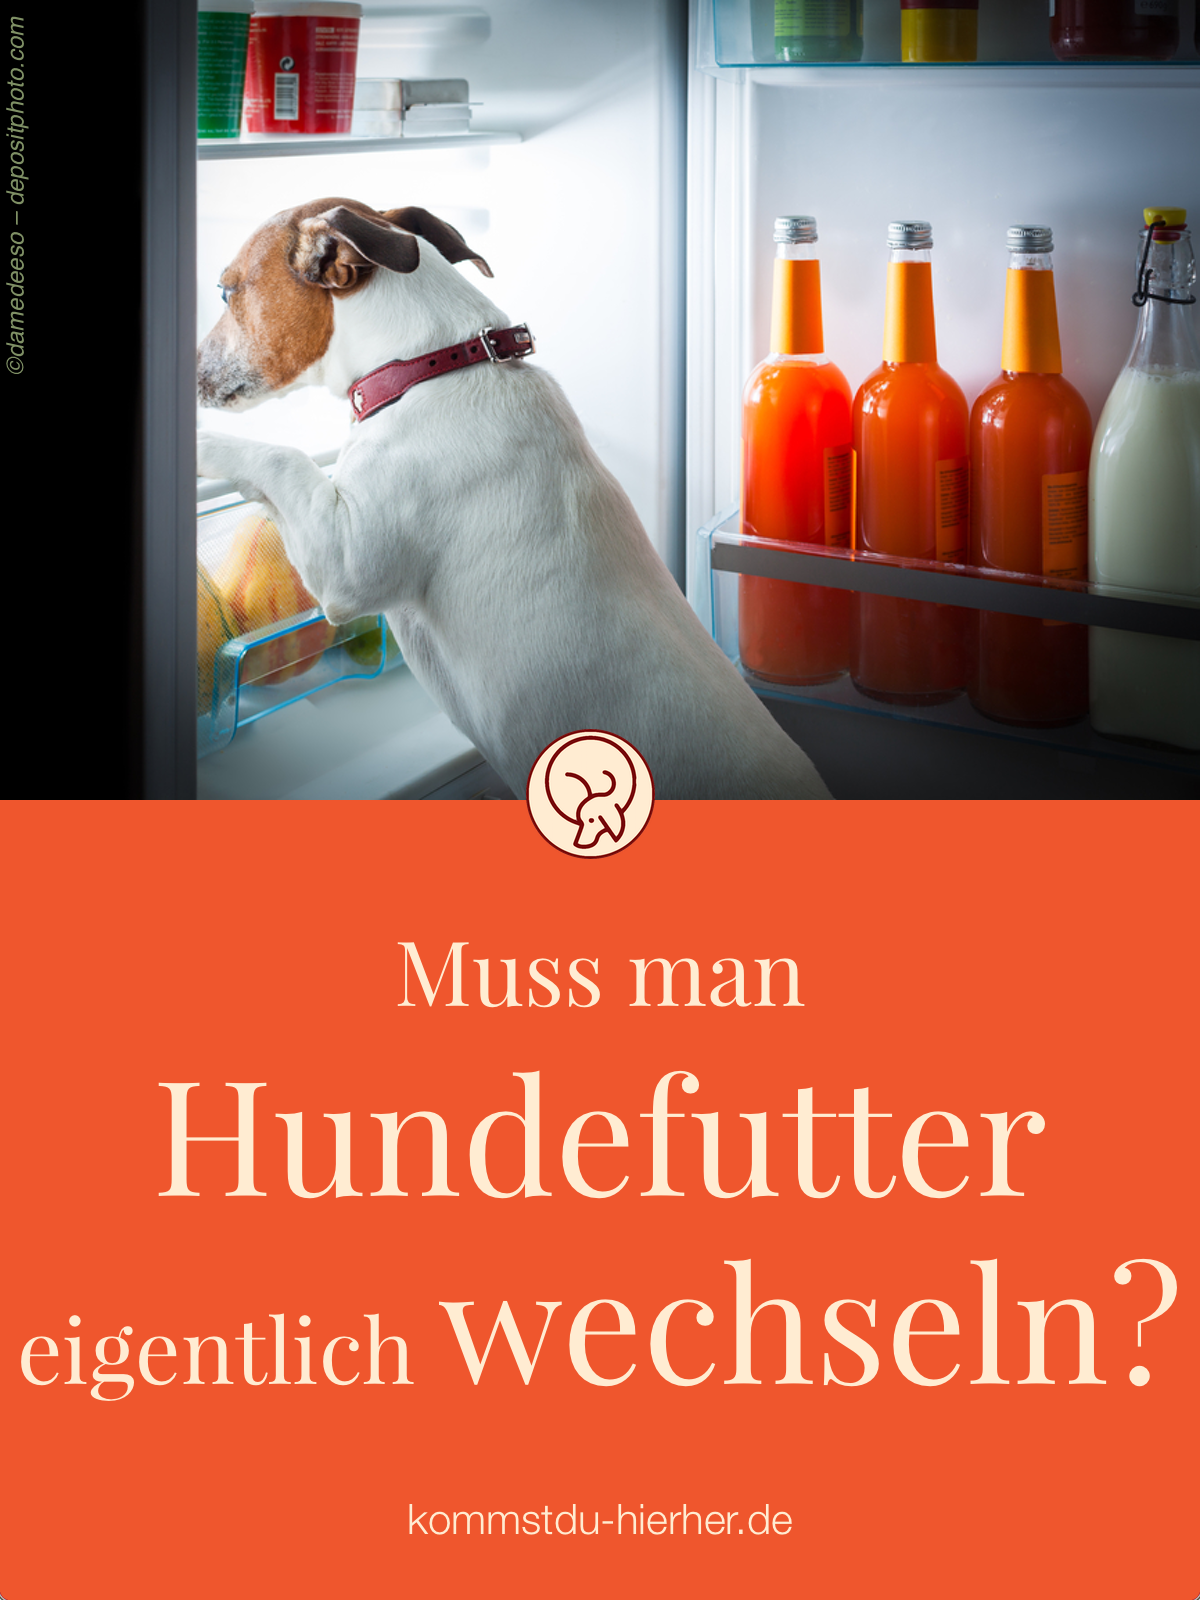 Pro Contra Hundefutter Wechseln Hunde Futter Hundefutter Und